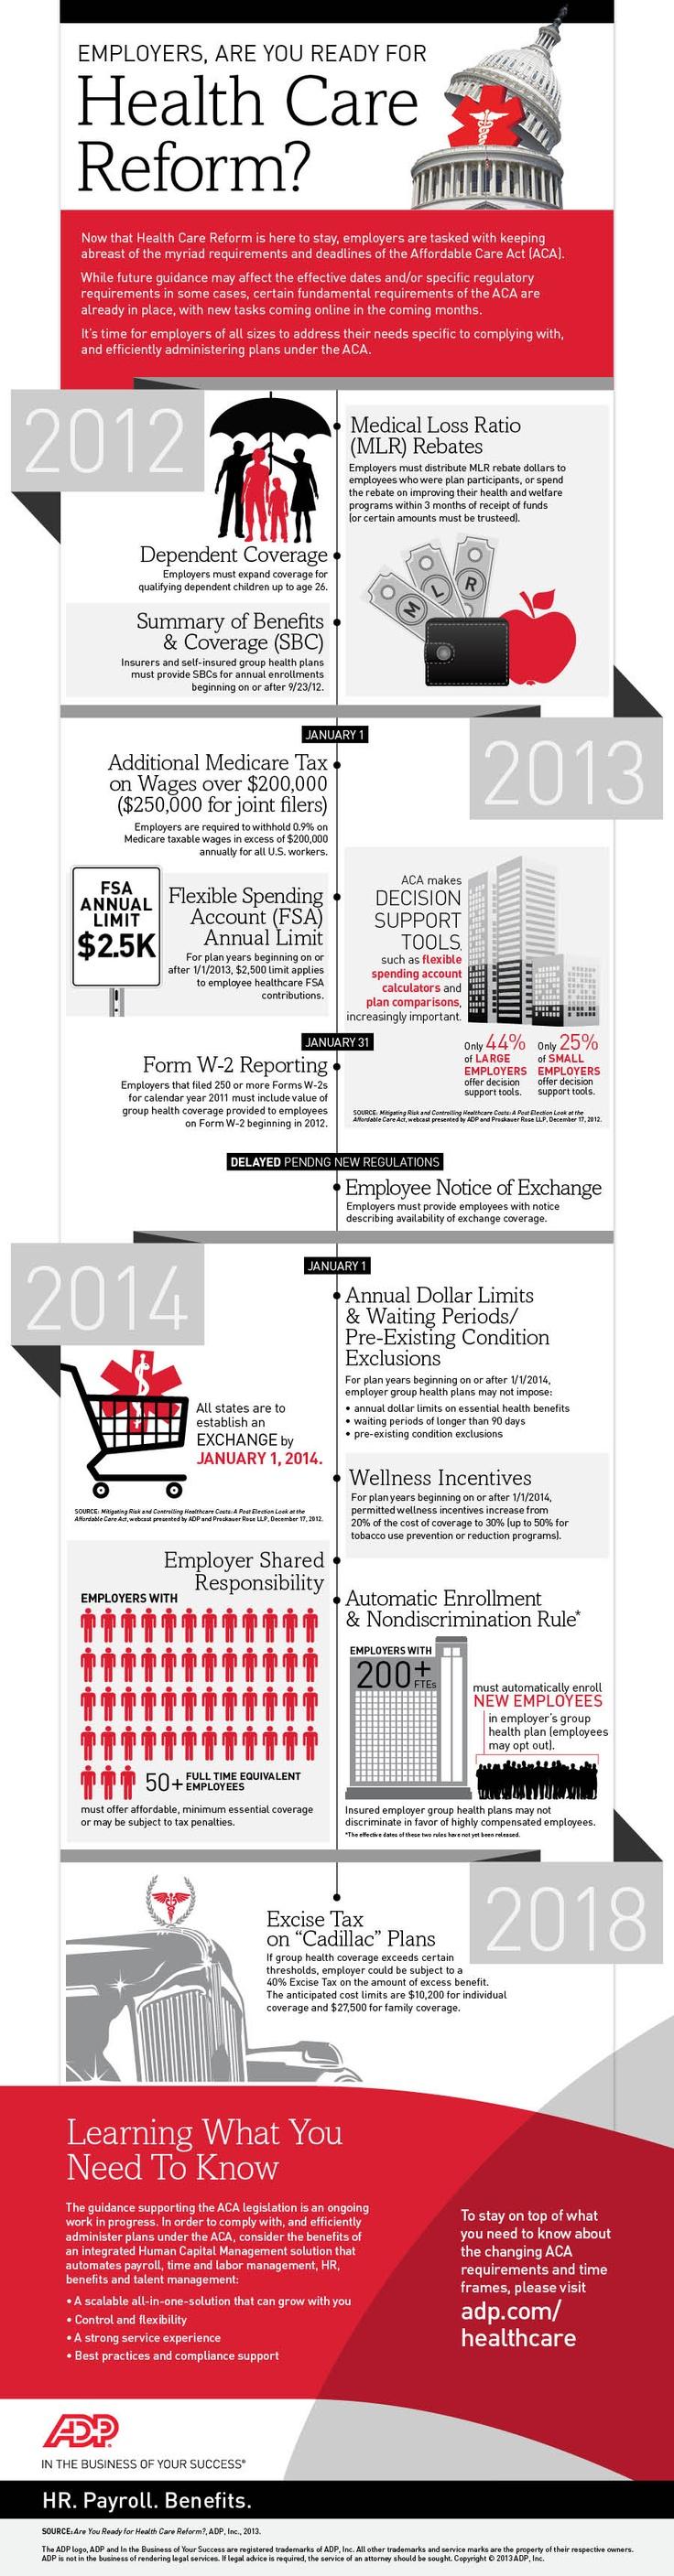 Healthcare Reform Infographic via ADP @ZaneBenefits